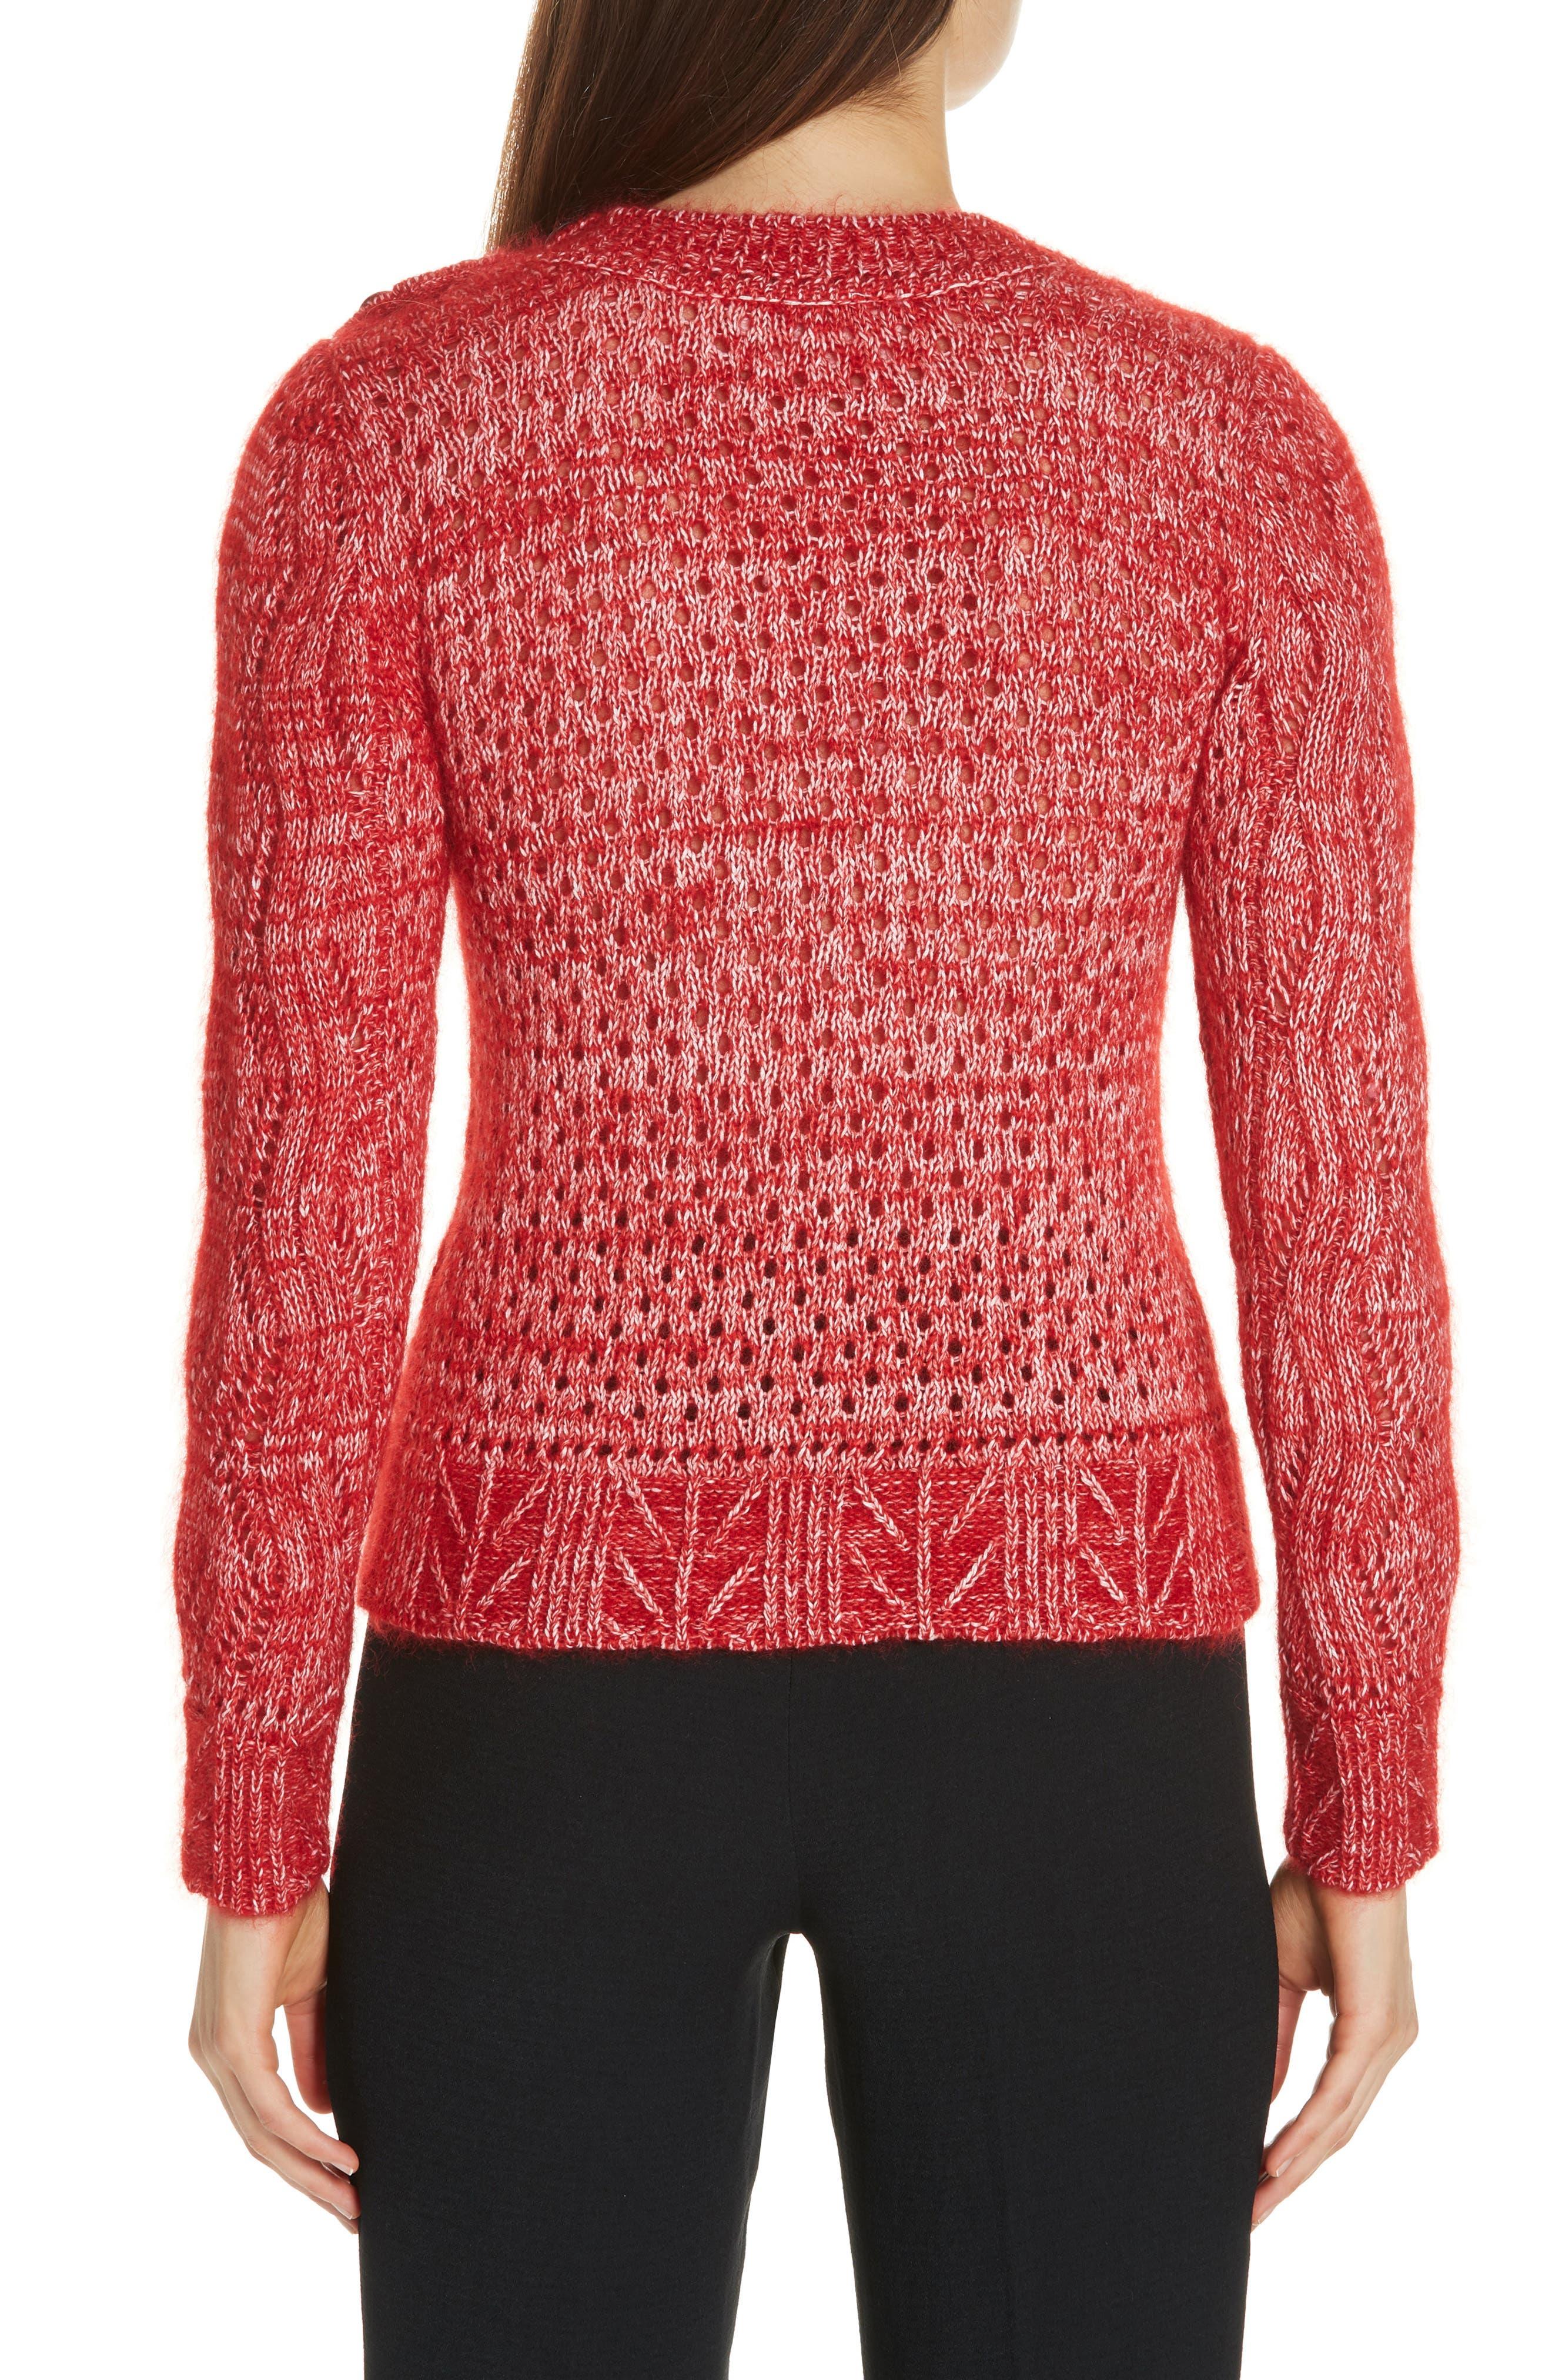 Numa Cotton & Silk Blend Sweater,                             Alternate thumbnail 2, color,                             600